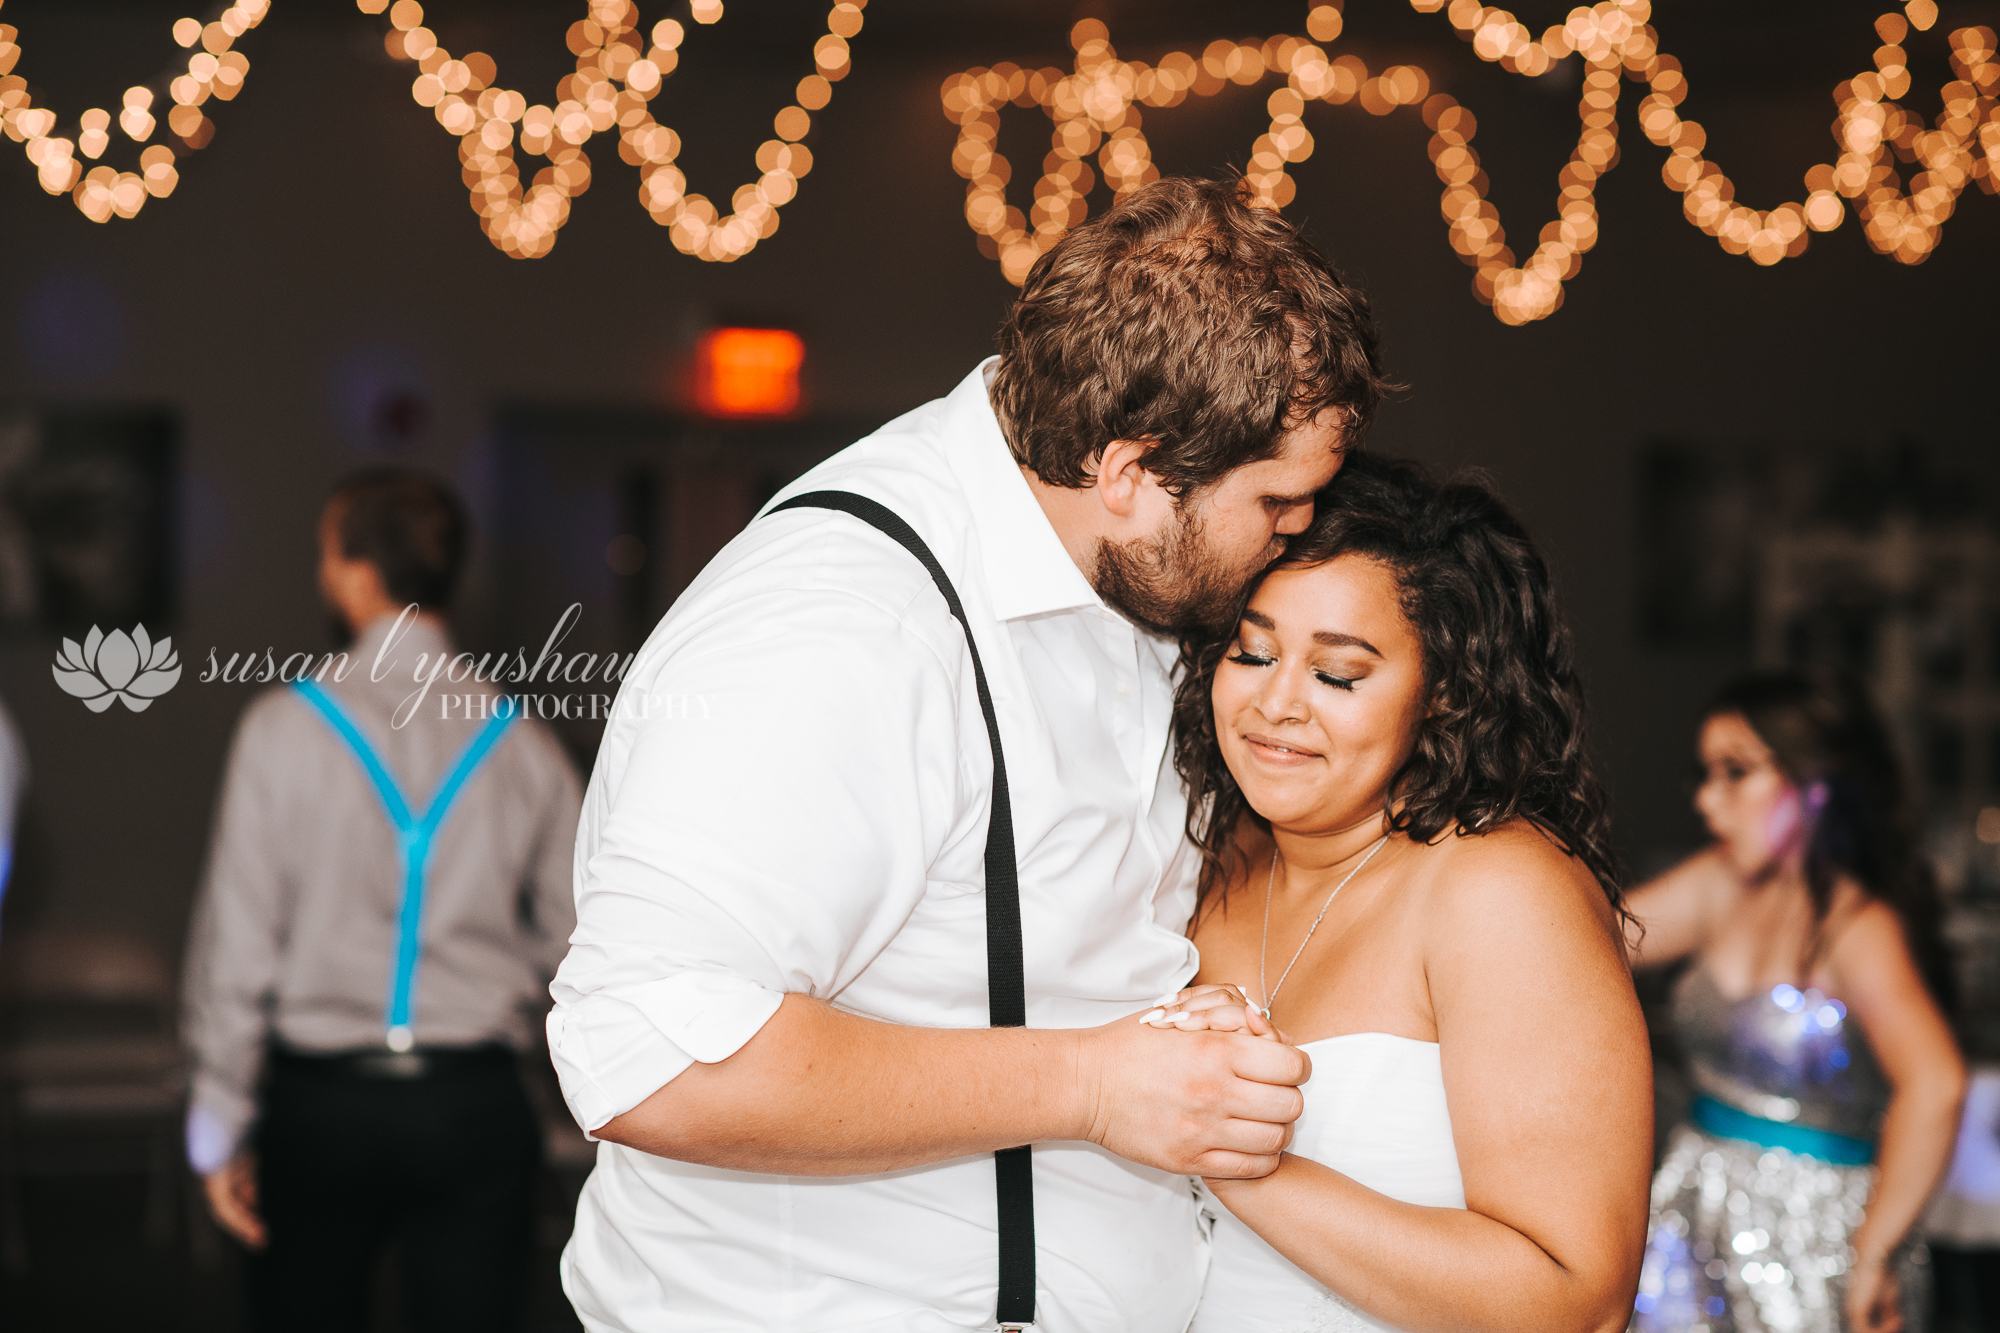 Katelyn and Wes Wedding Photos 07-13-2019 SLY Photography-130.jpg